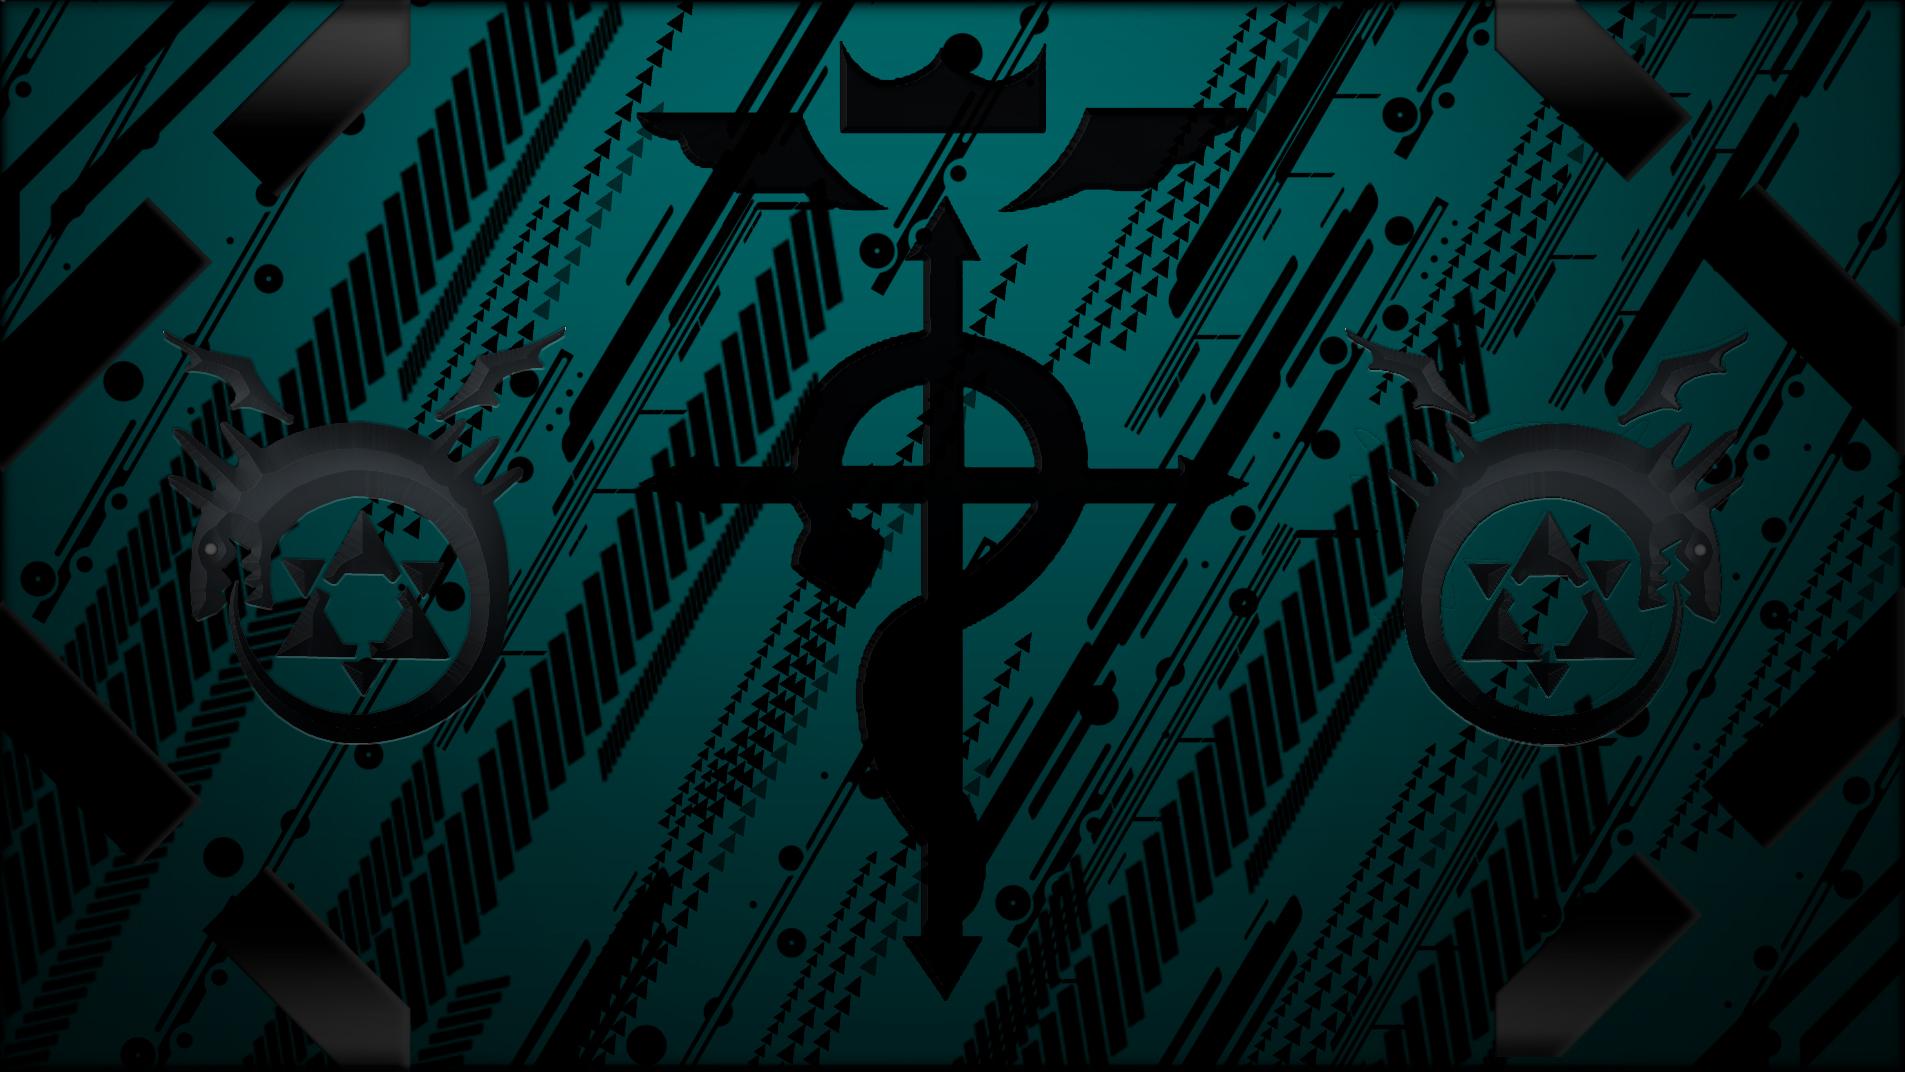 Fma Wallpaper Quotes 70 Fullmetal Alchemist Hd Wallpapers Backgrounds